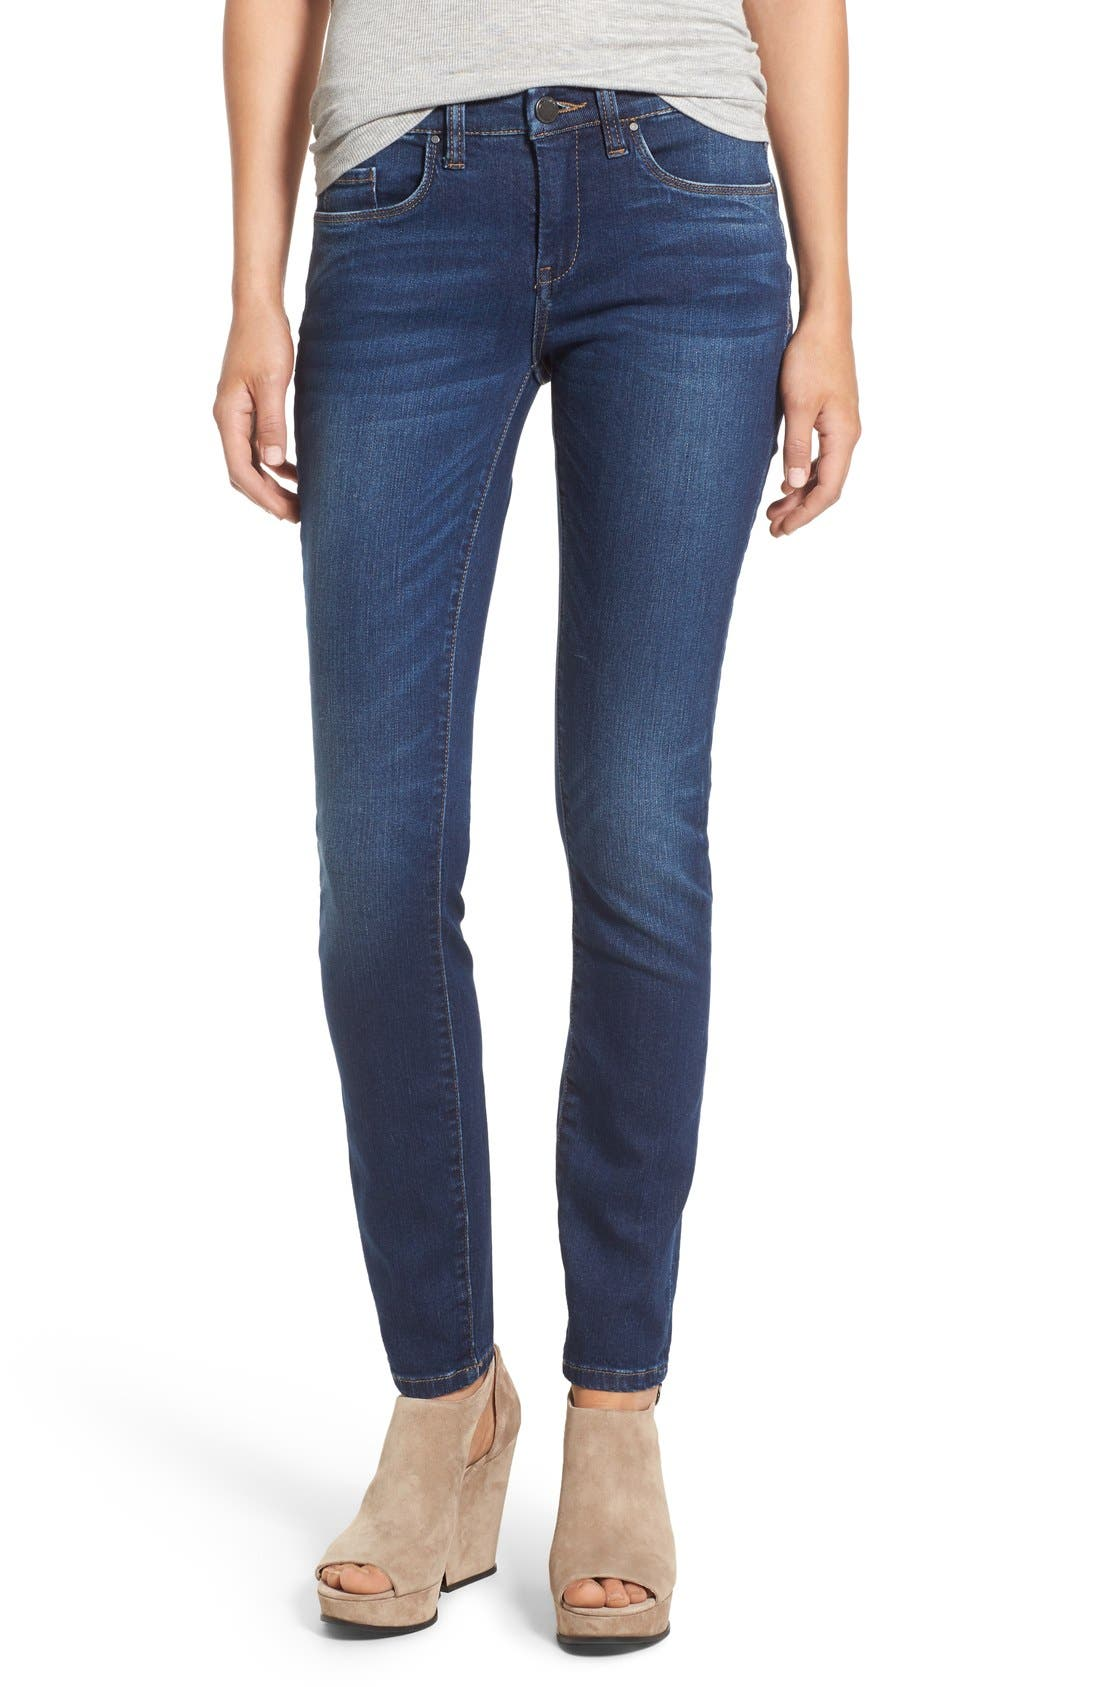 Main Image - BLANKNYC 'Buffering' Skinny Jeans (Call it Karma)